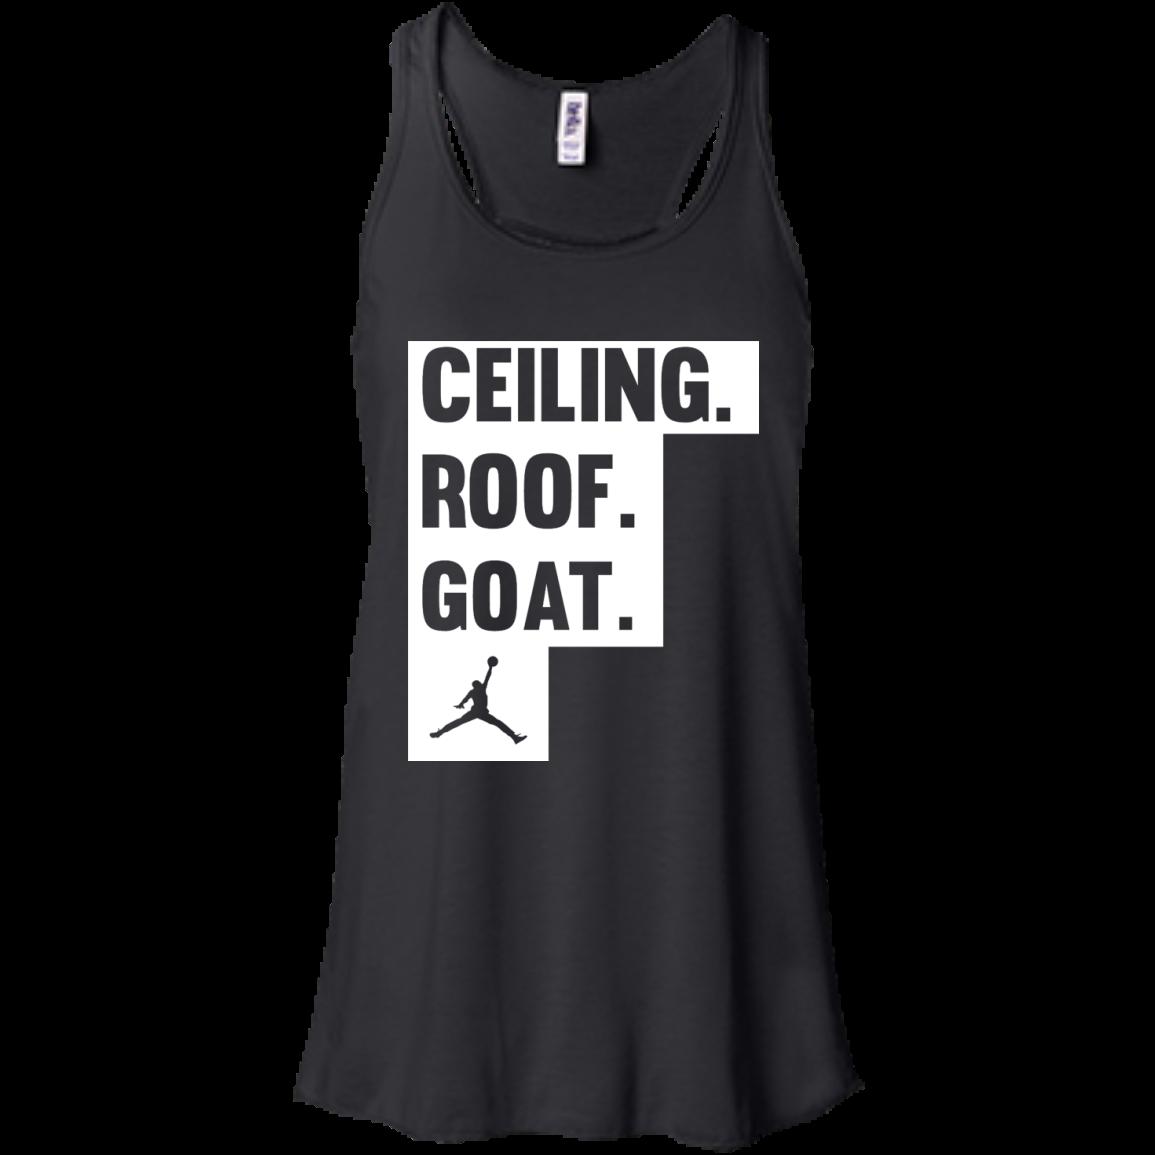 image 948px Jordan: Ceiling Roof Goat T Shirt, Hoodies, Tank